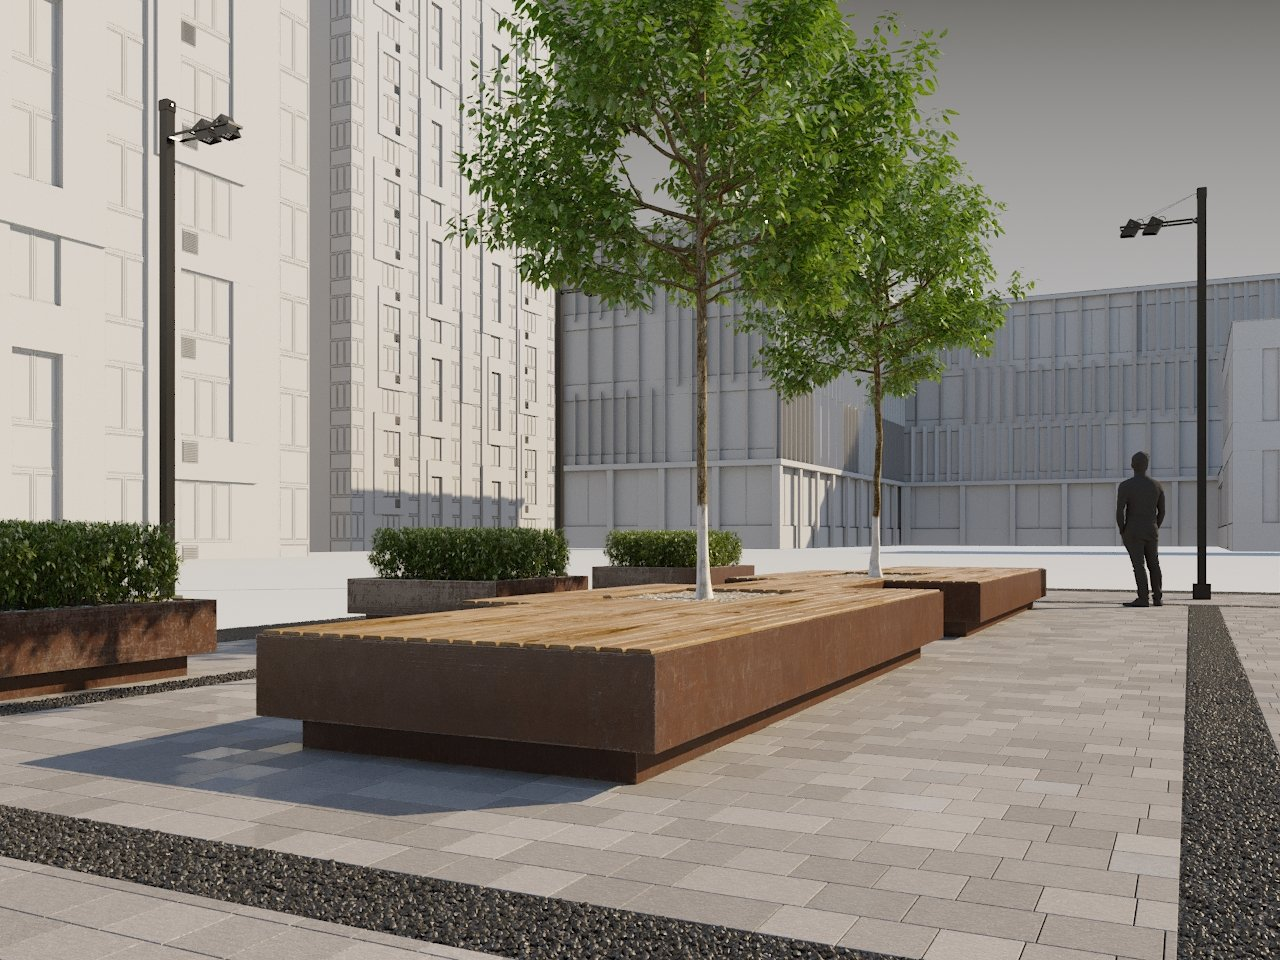 Street Decor part 020 3D Model in Cityscapes 3DExport